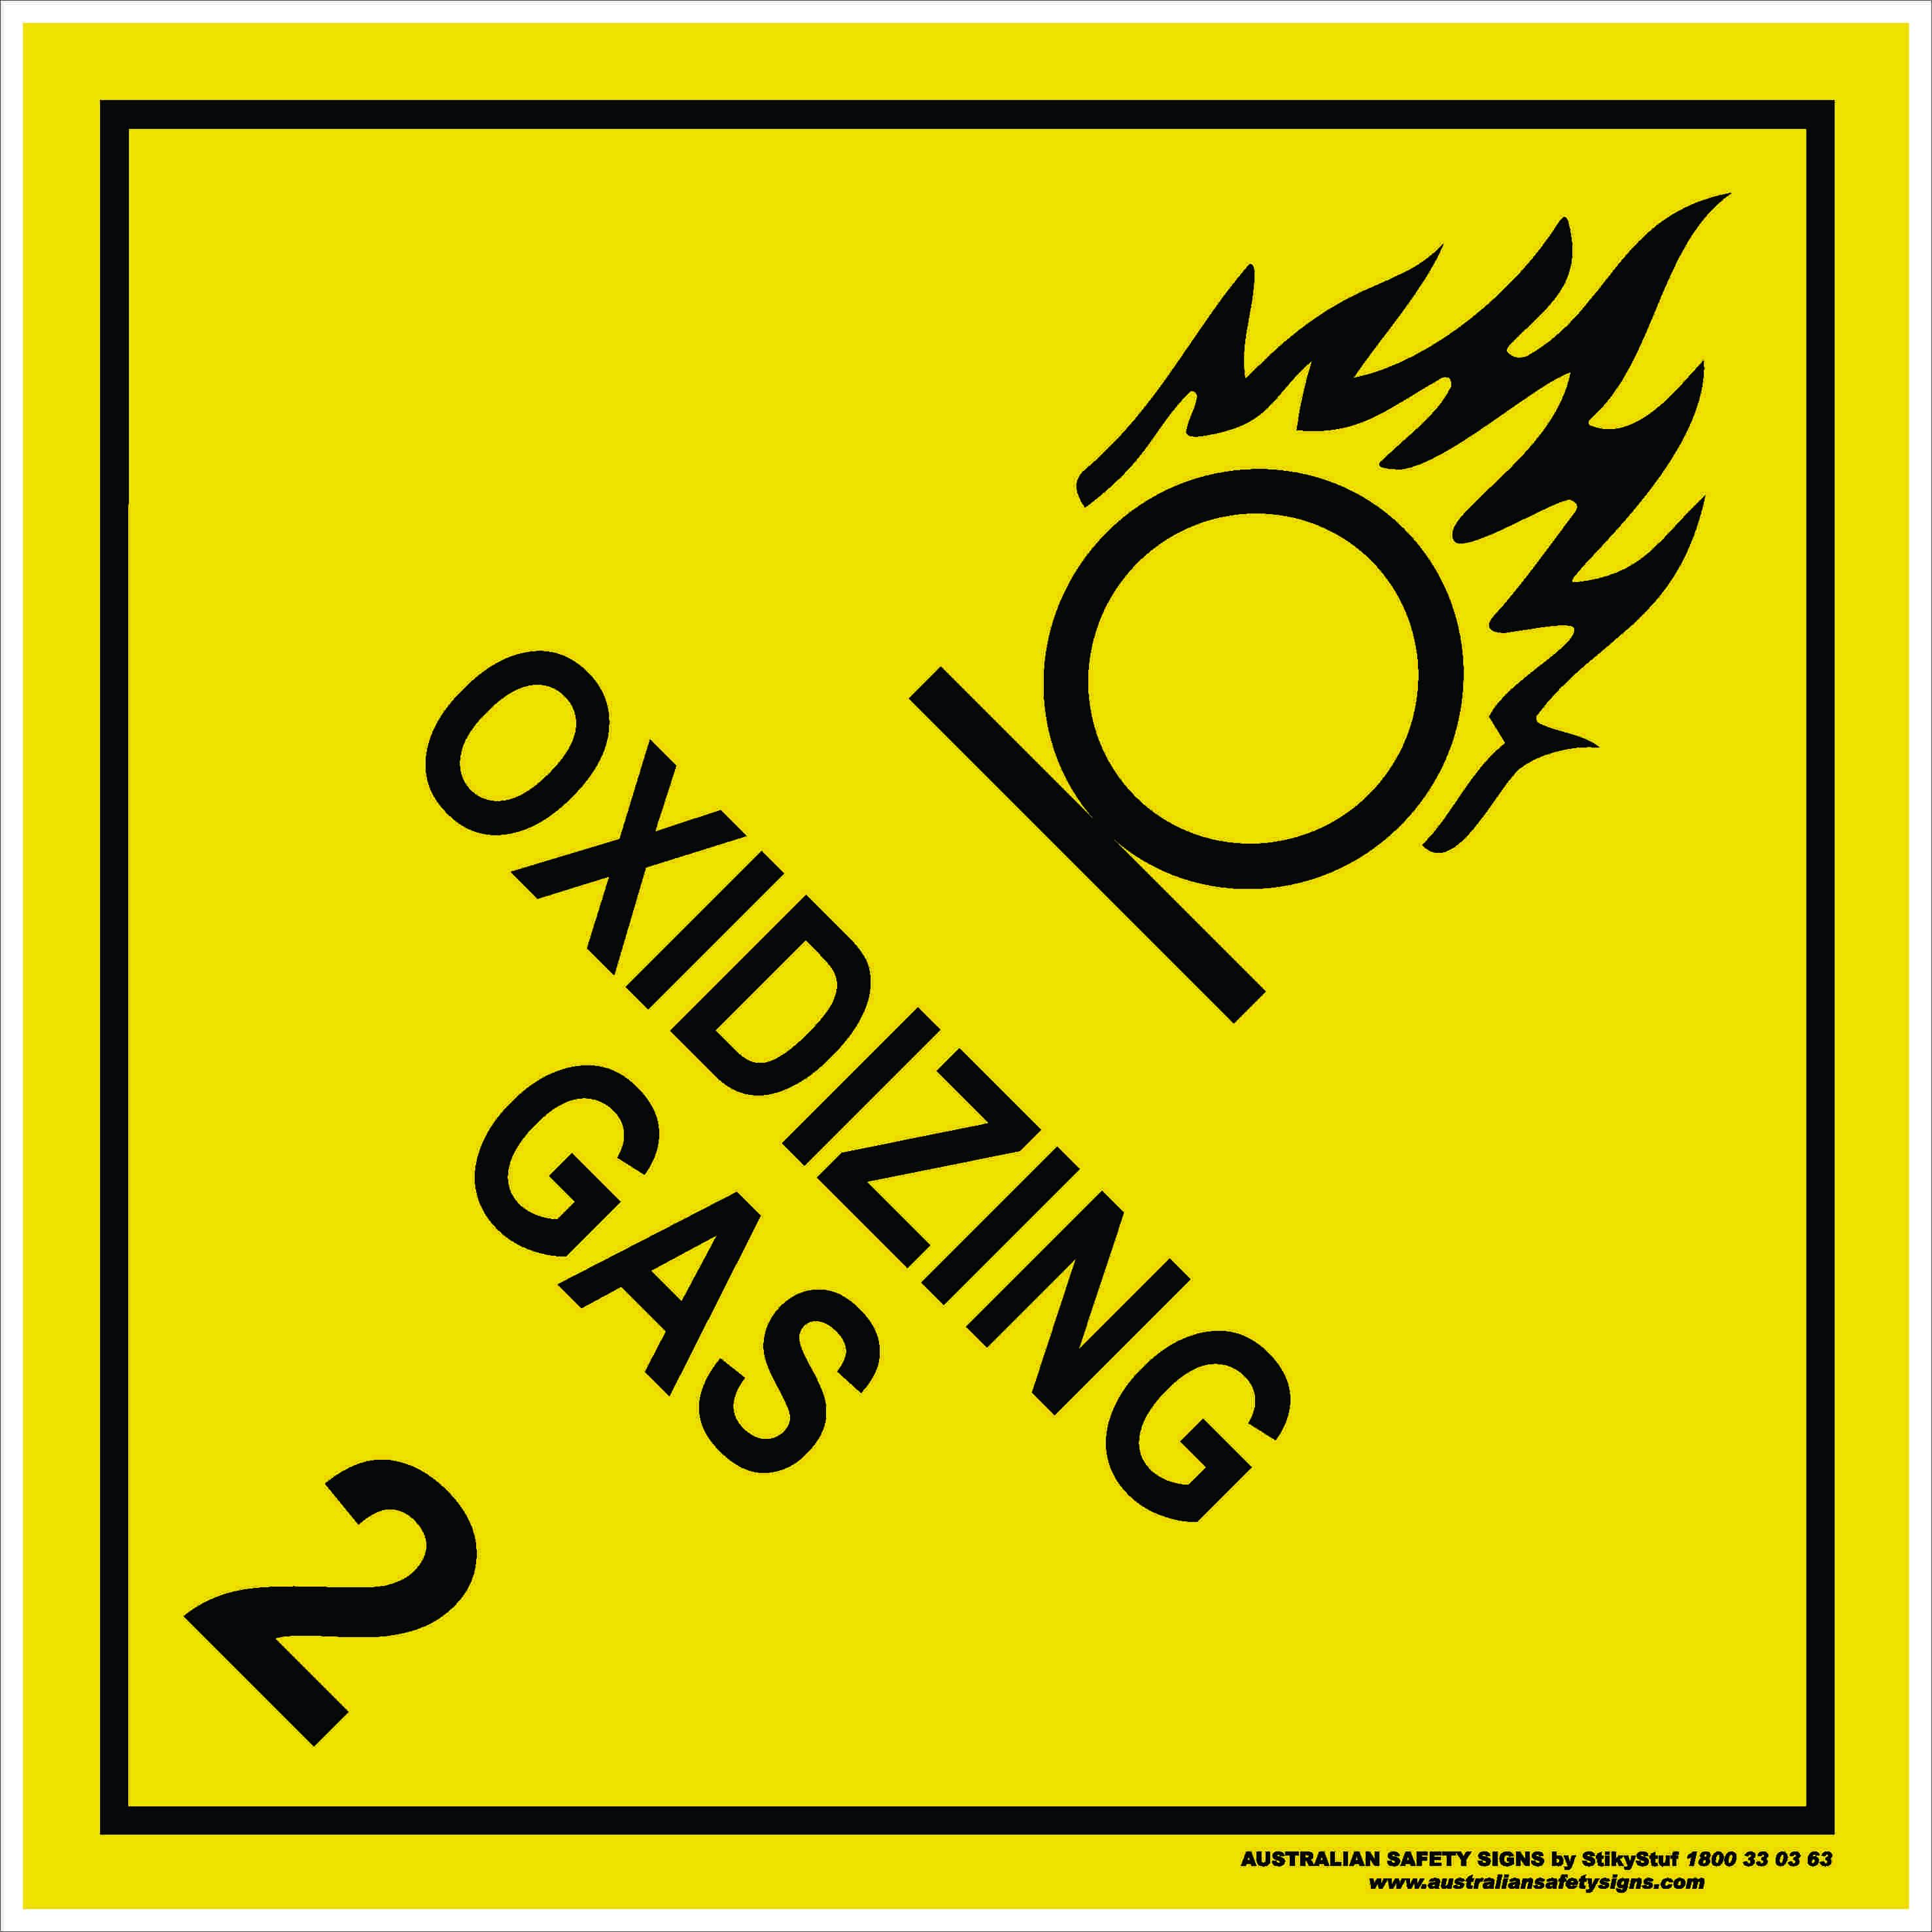 Hazchem Signs CLASS 2 - OXIDIZING GAS